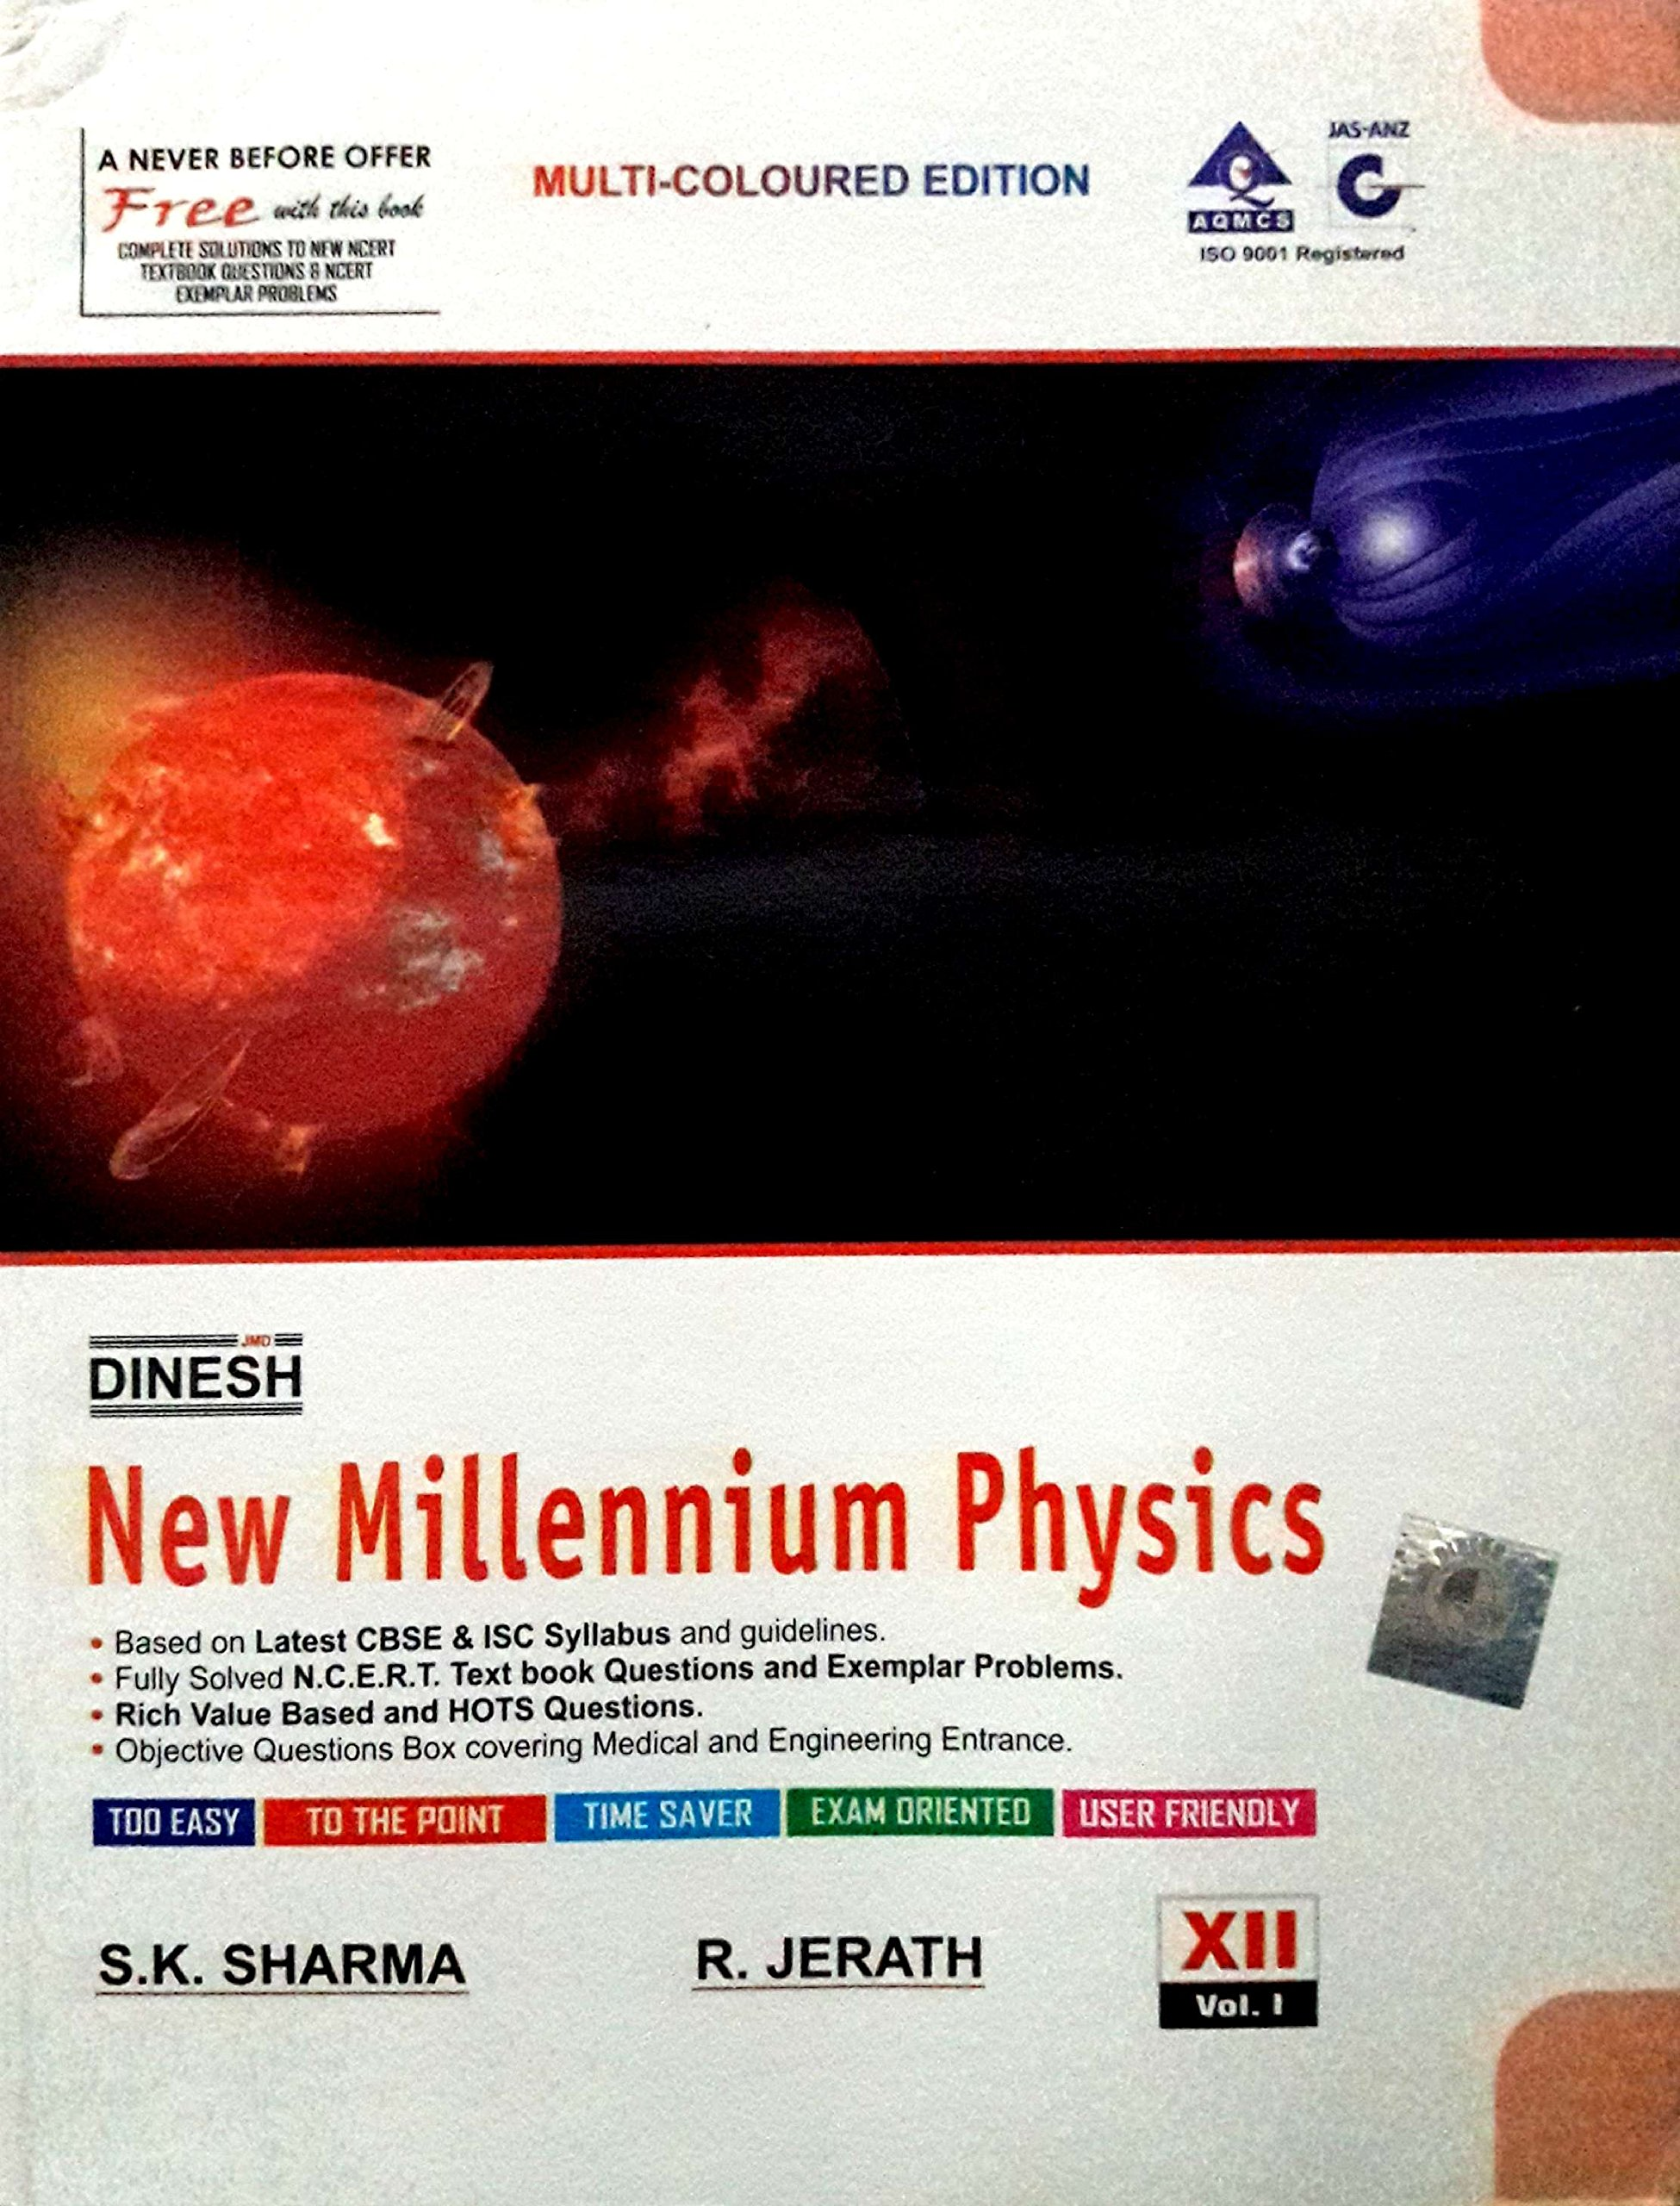 DINESH NEW MILLENNIUM PHYSICS CLASS 12 VOL I OR II 2017-18: Amazon.in: SK  SHARMA, R JEPATH: Books